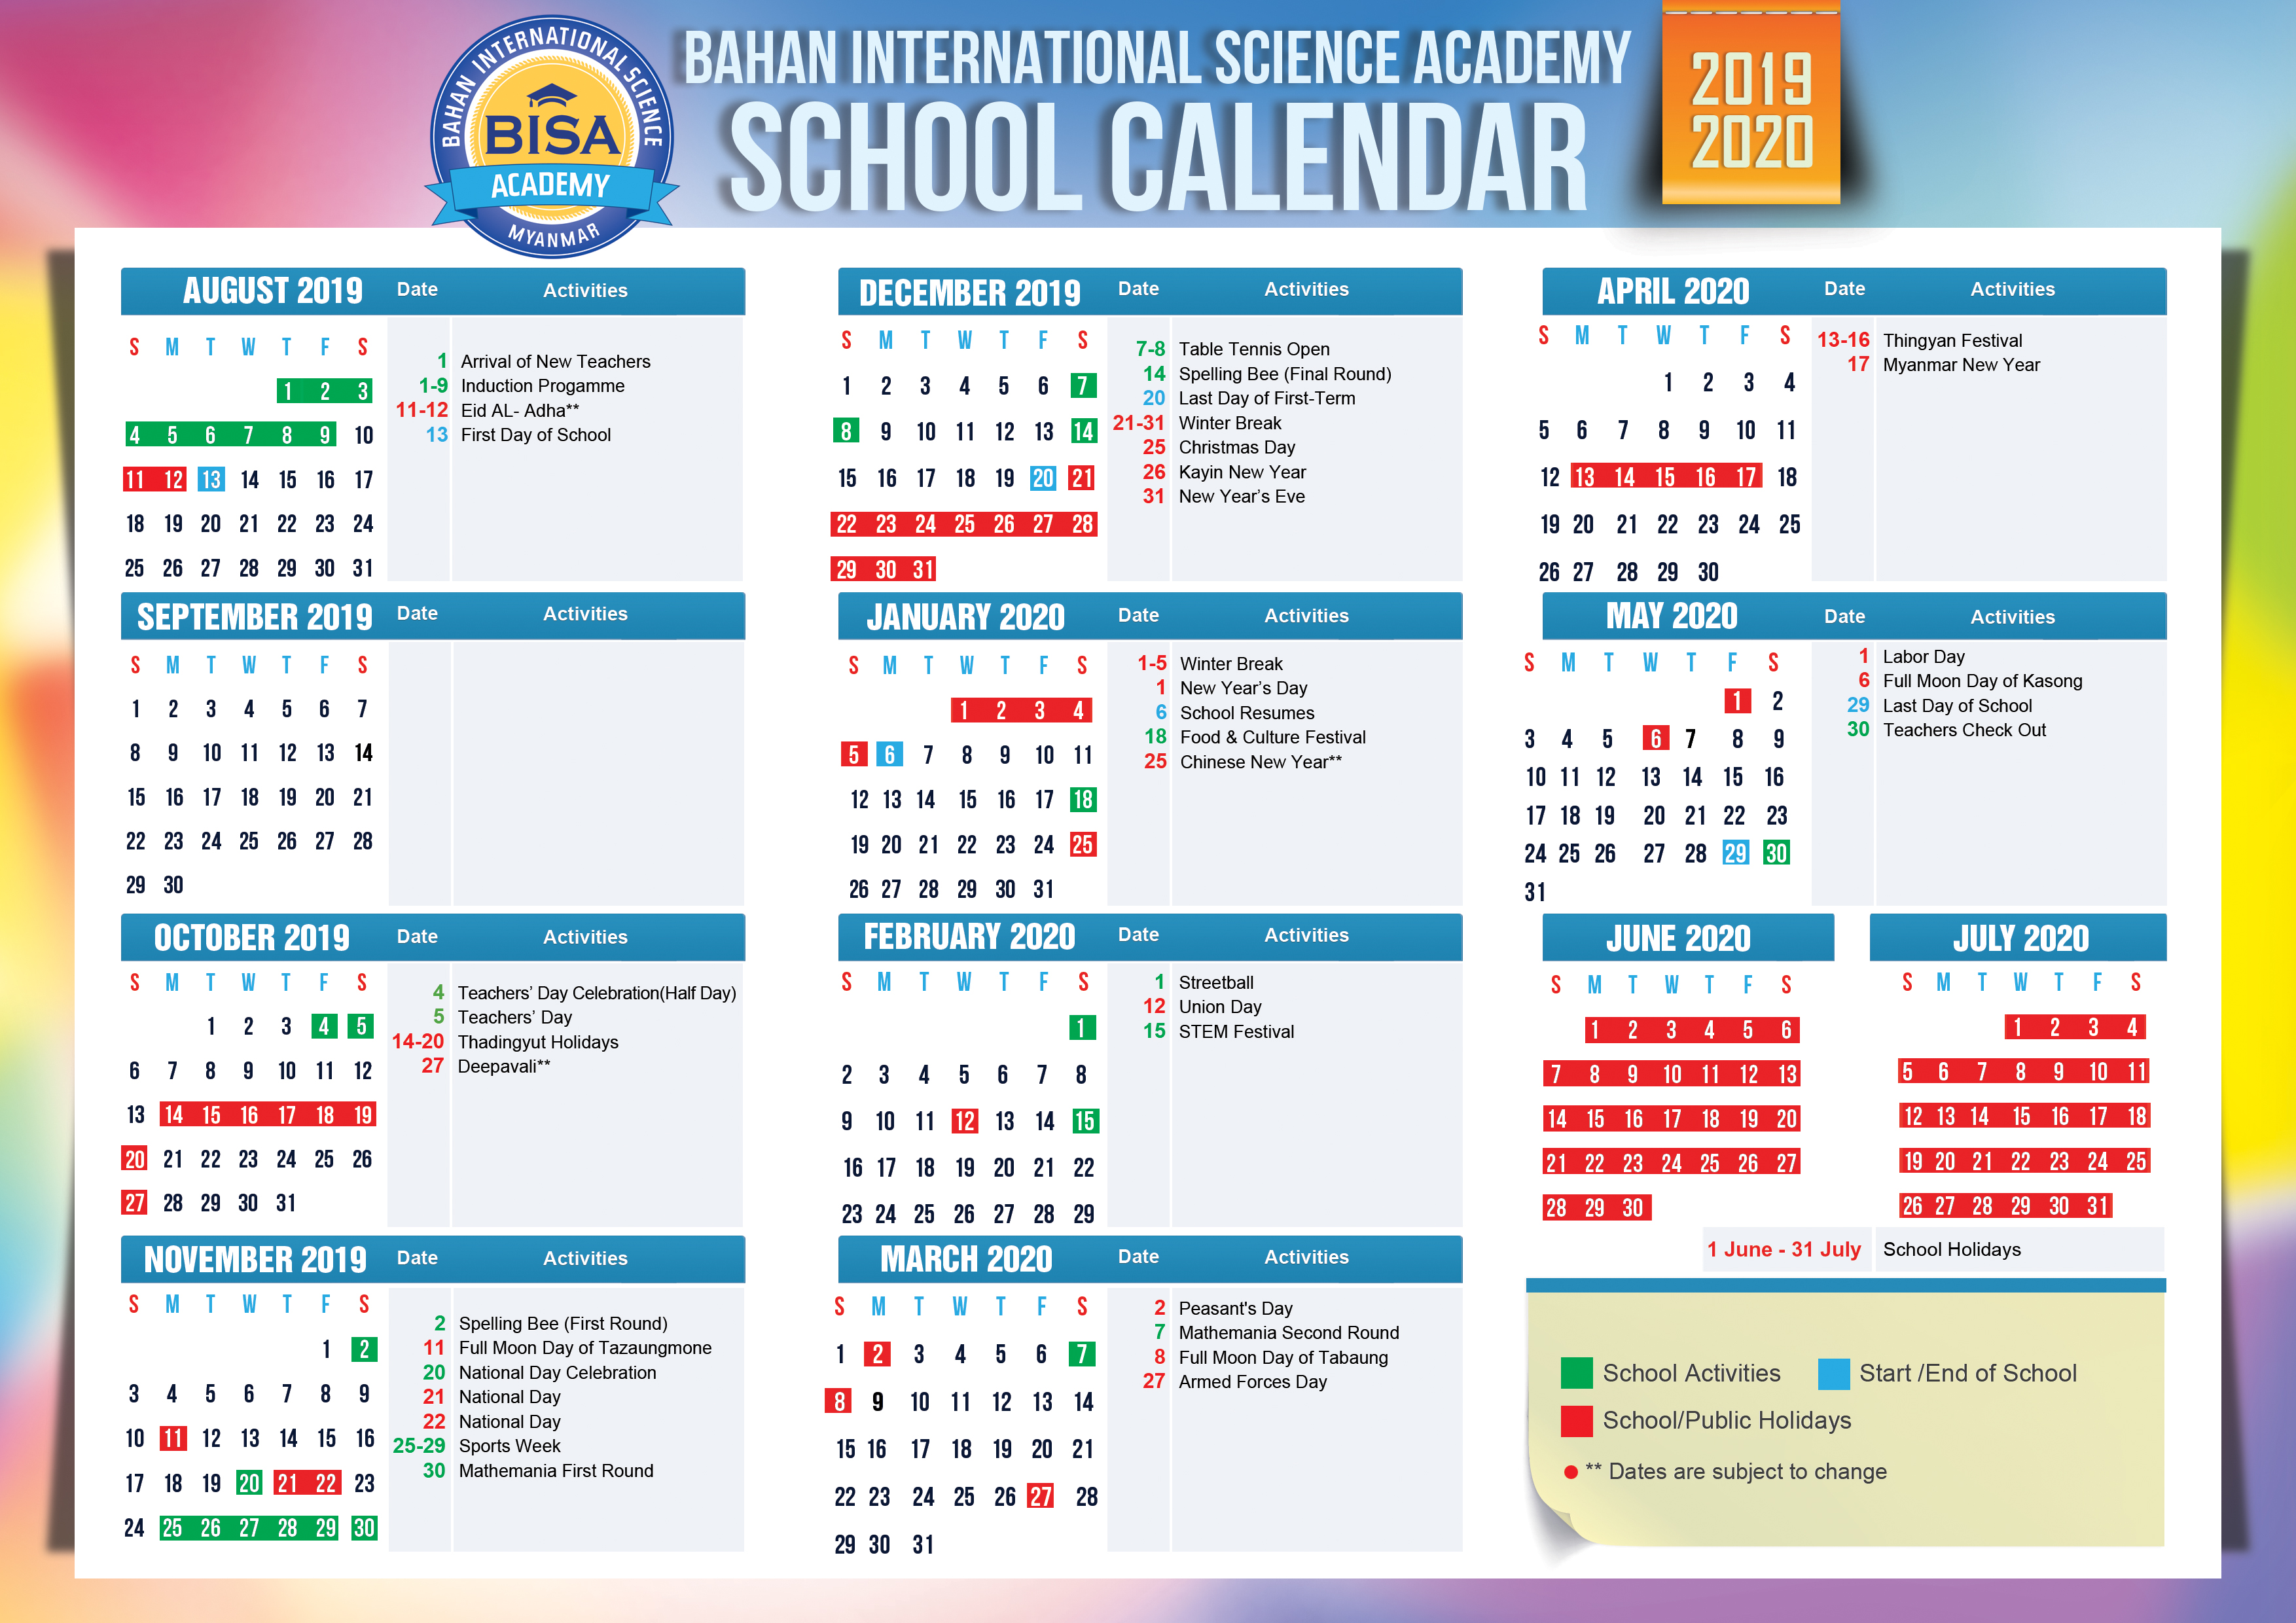 Bahan International Science Academy: School Calendar